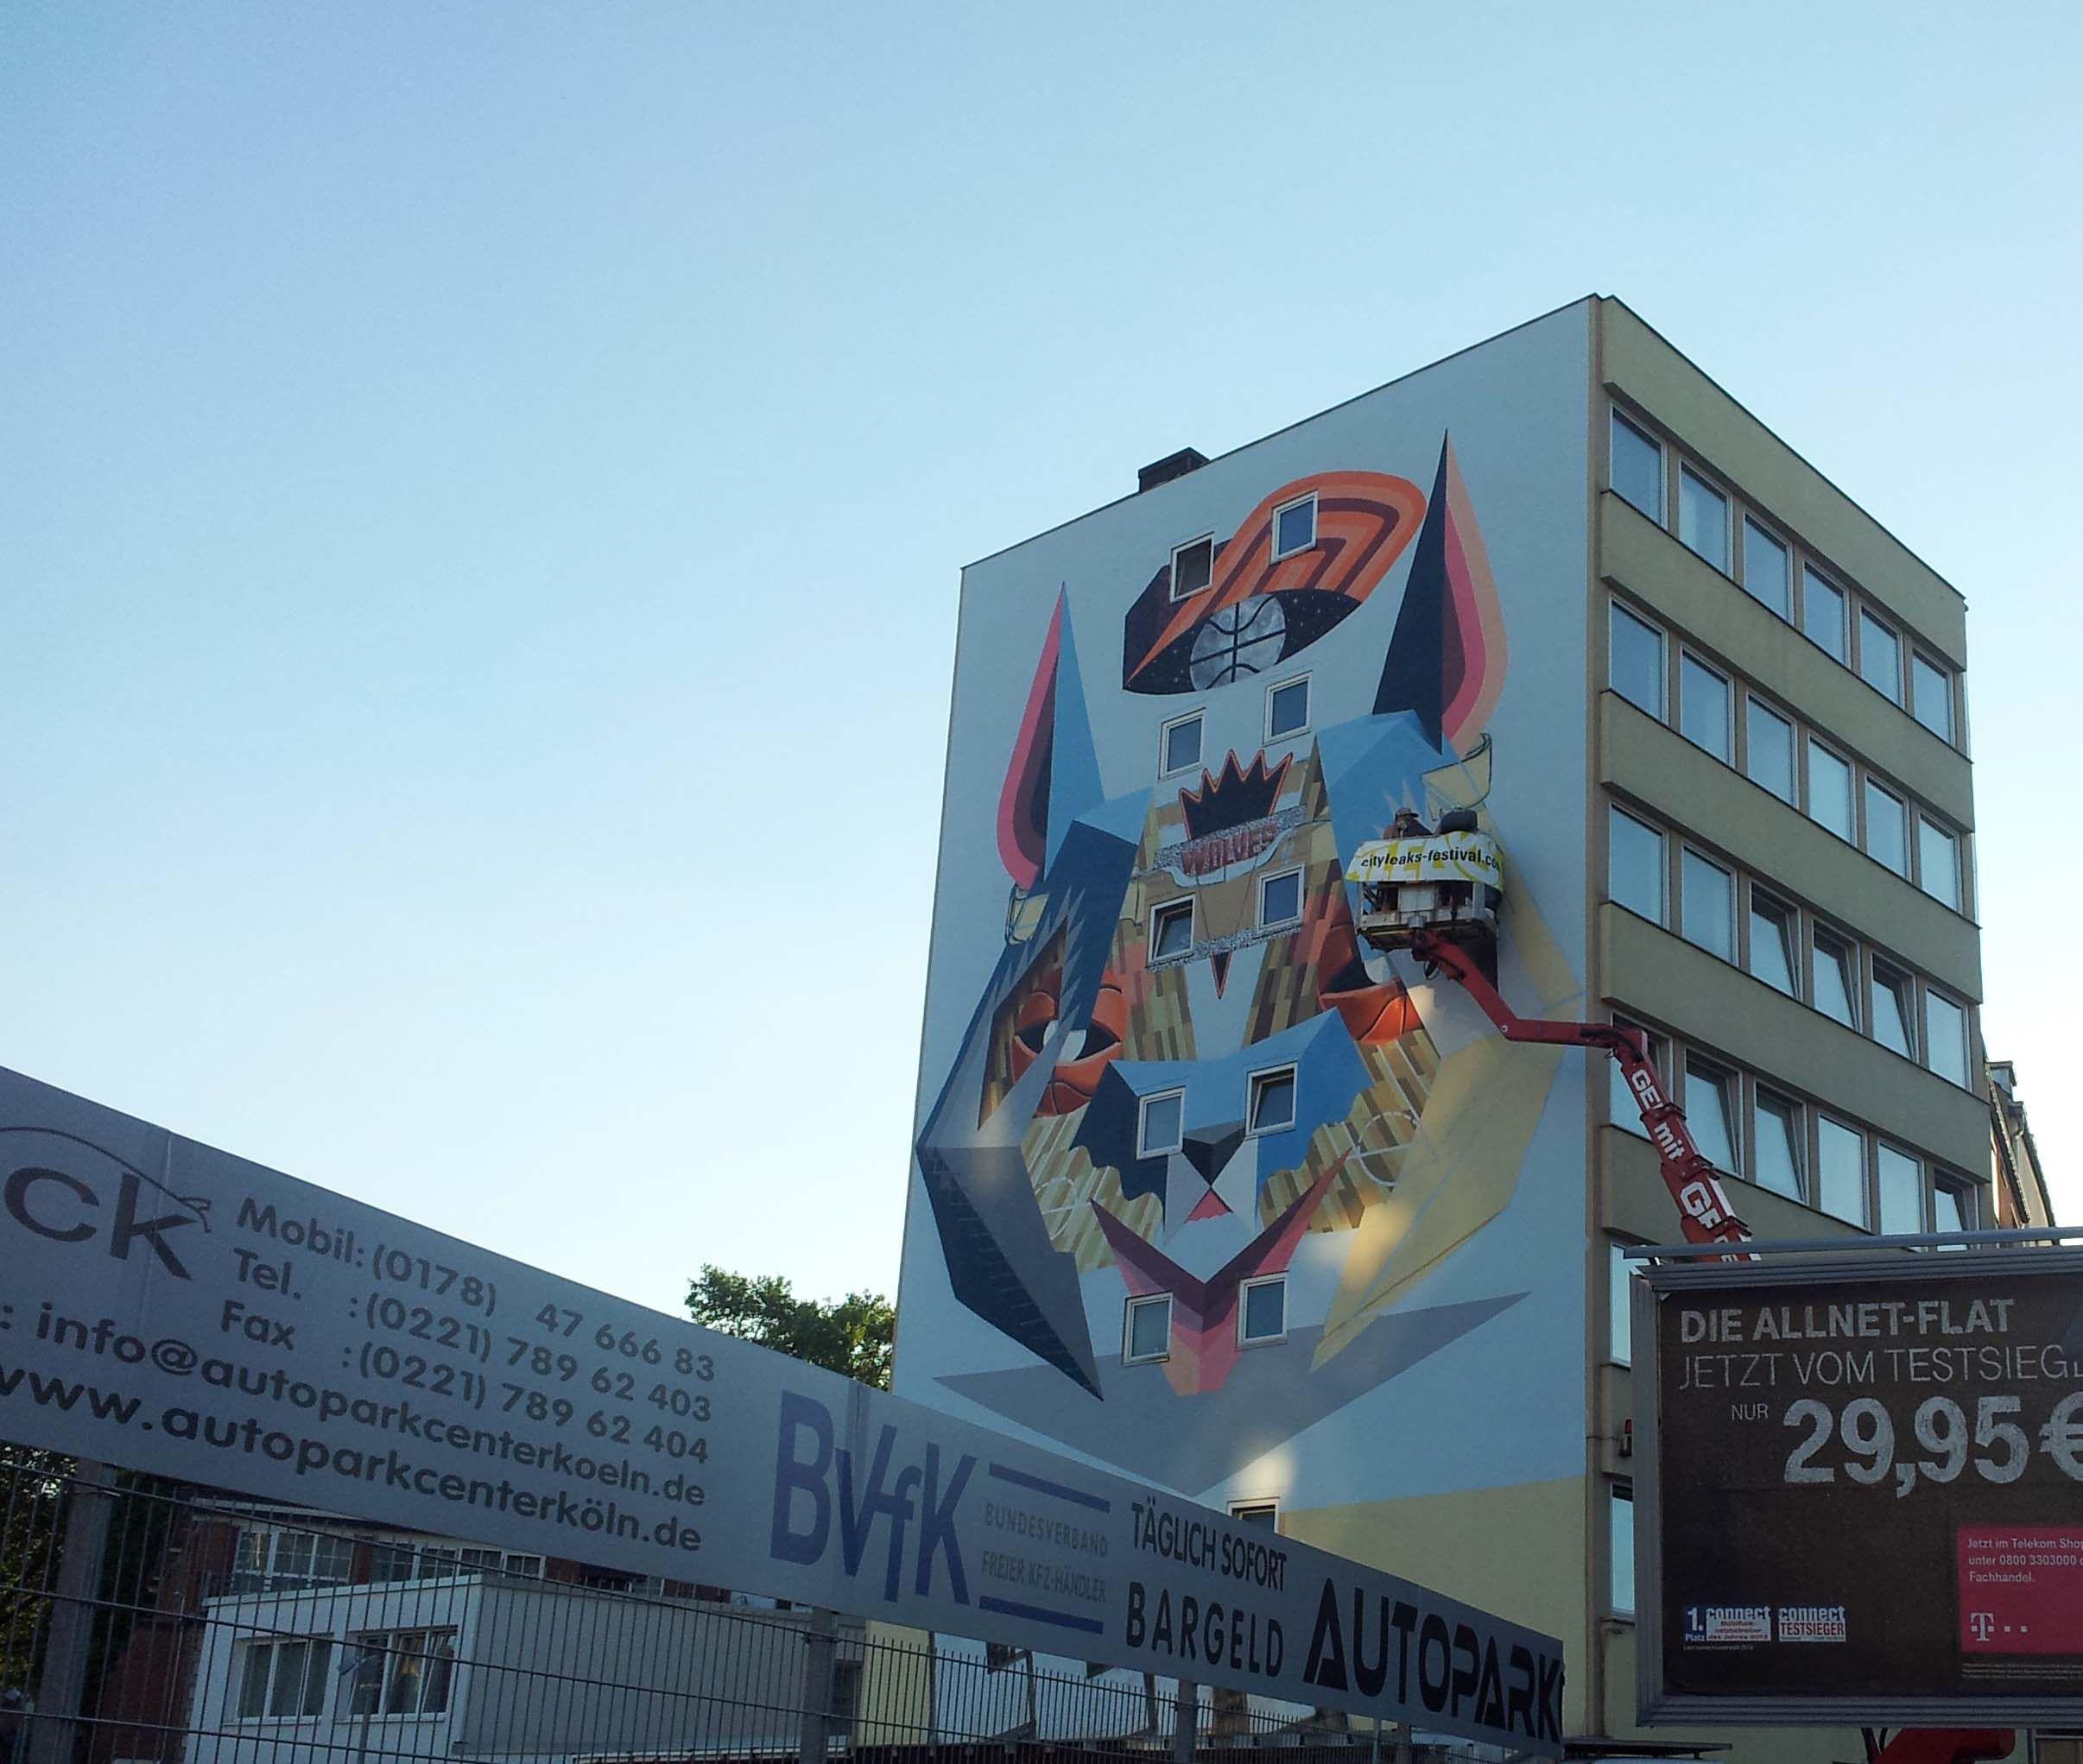 Künstler Köln cityleaks festival 2013 in köln trierer straße 61 künstler low